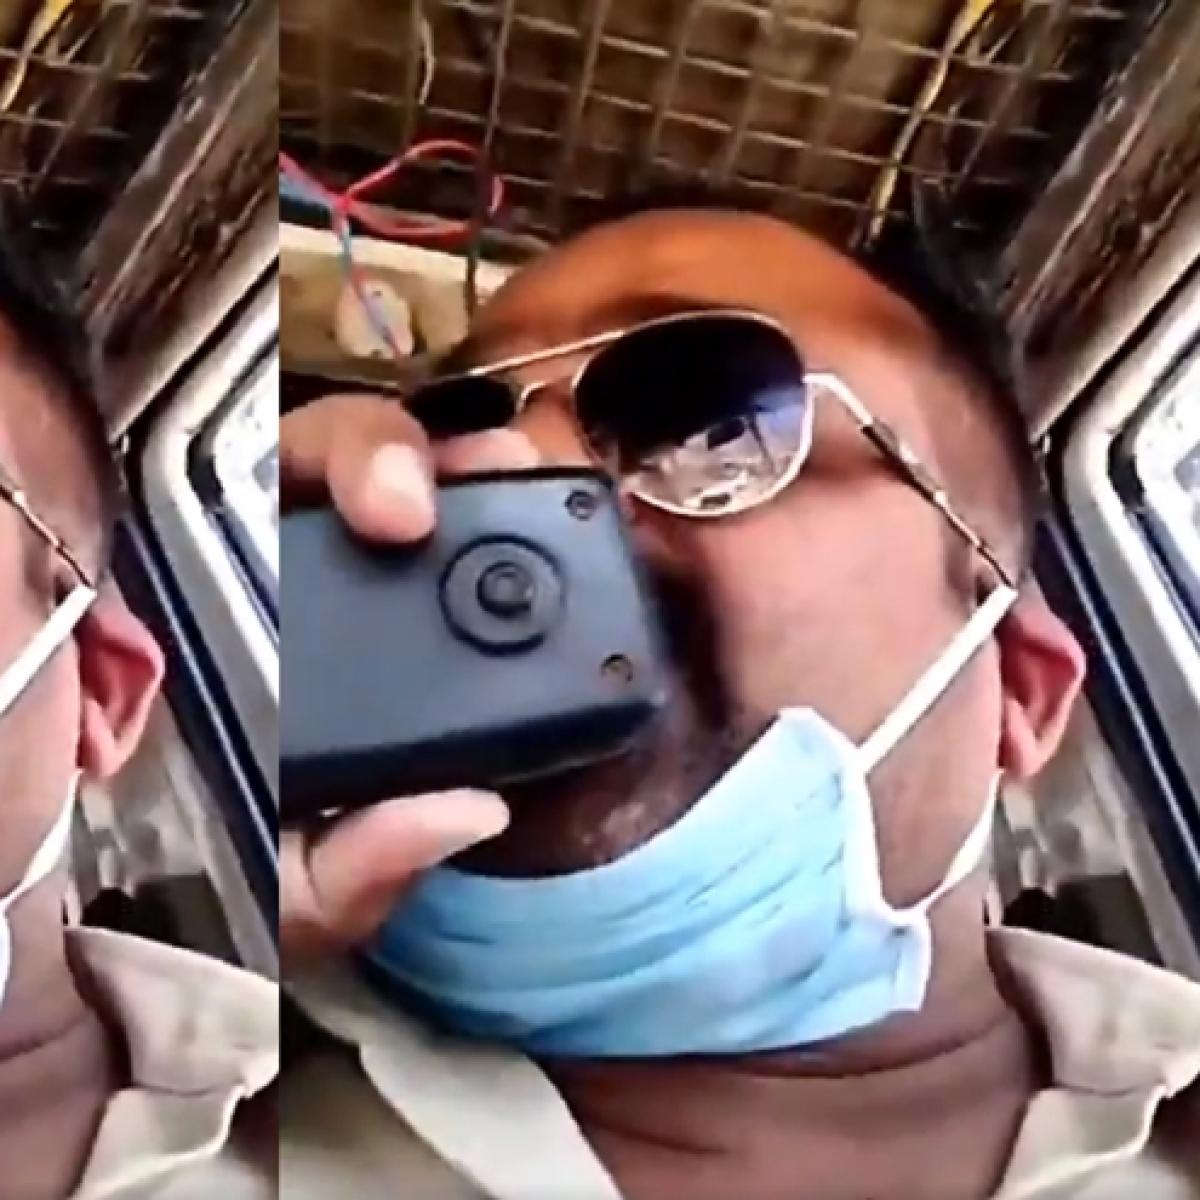 'Rohit Shetty wants his location': Twitter hails cop who said 'tod denge tumhare sharir ka kona kona, but hone nahin denge corona'